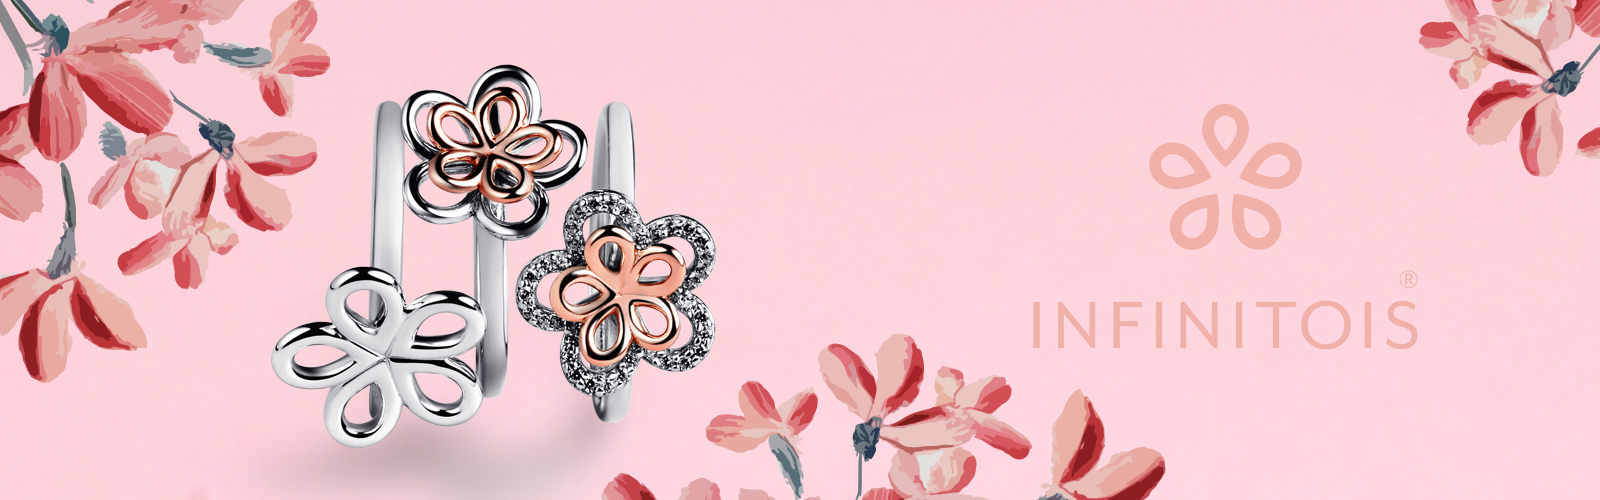 Gisser-infinitois-zilveren-sieraden-Wolters-Juweliers-Coevorden-Emmen